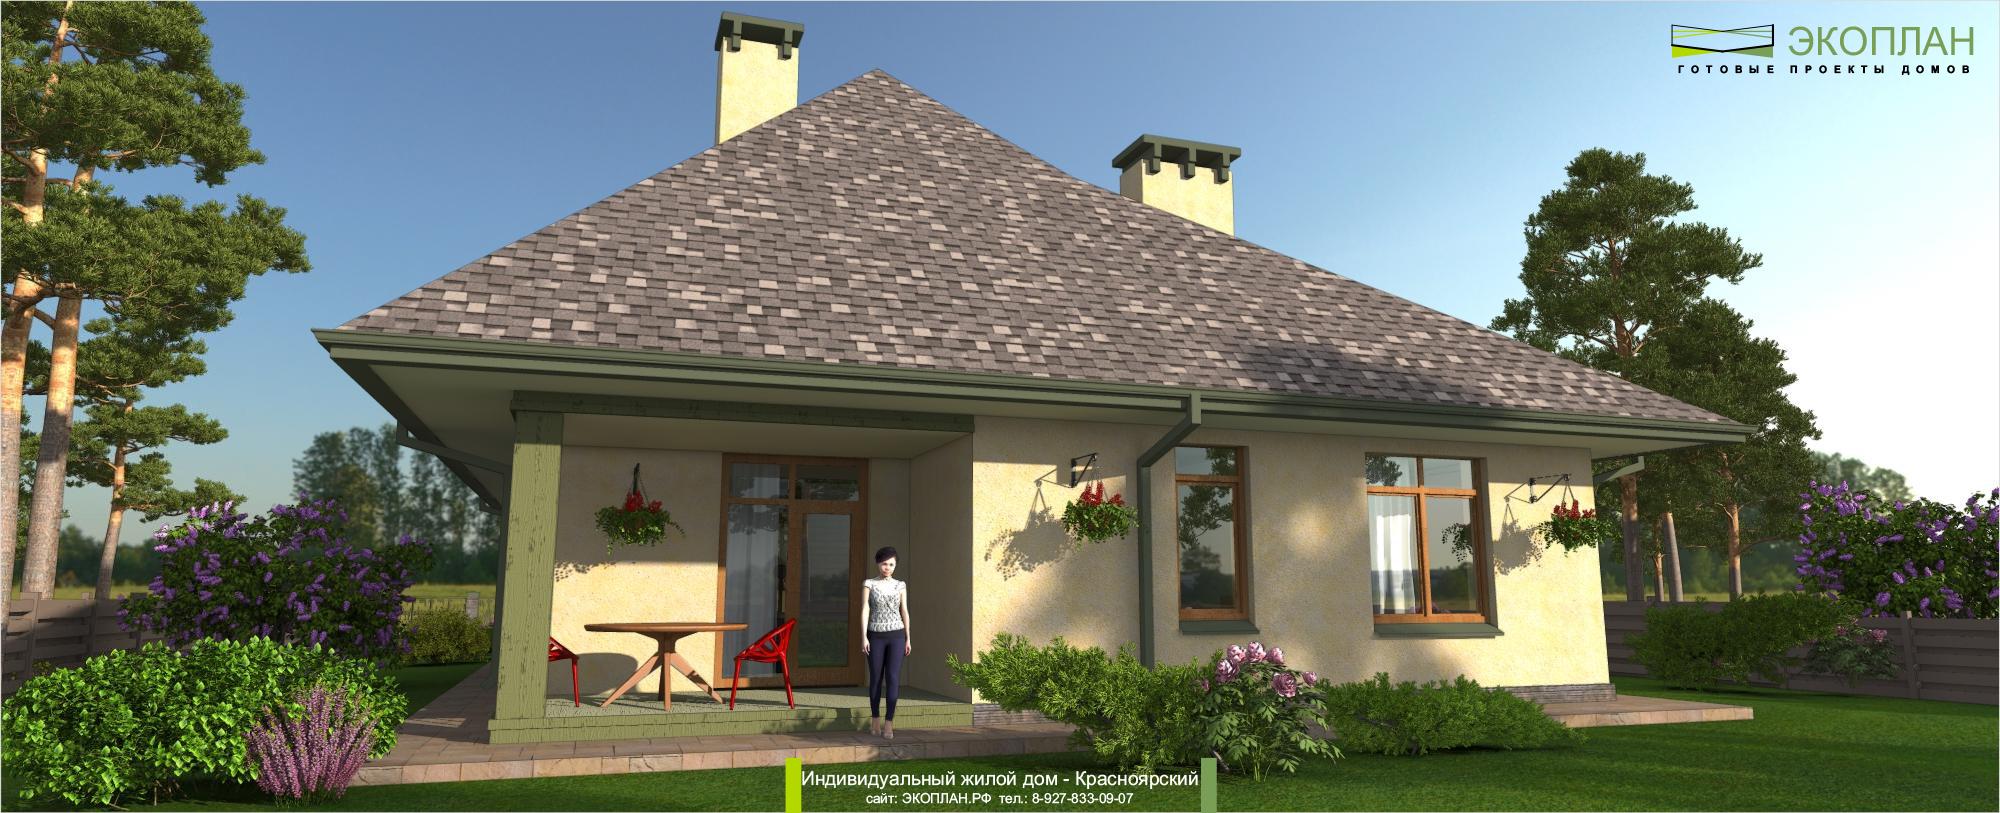 Красноярский - Проект дома - Экоплан фасад